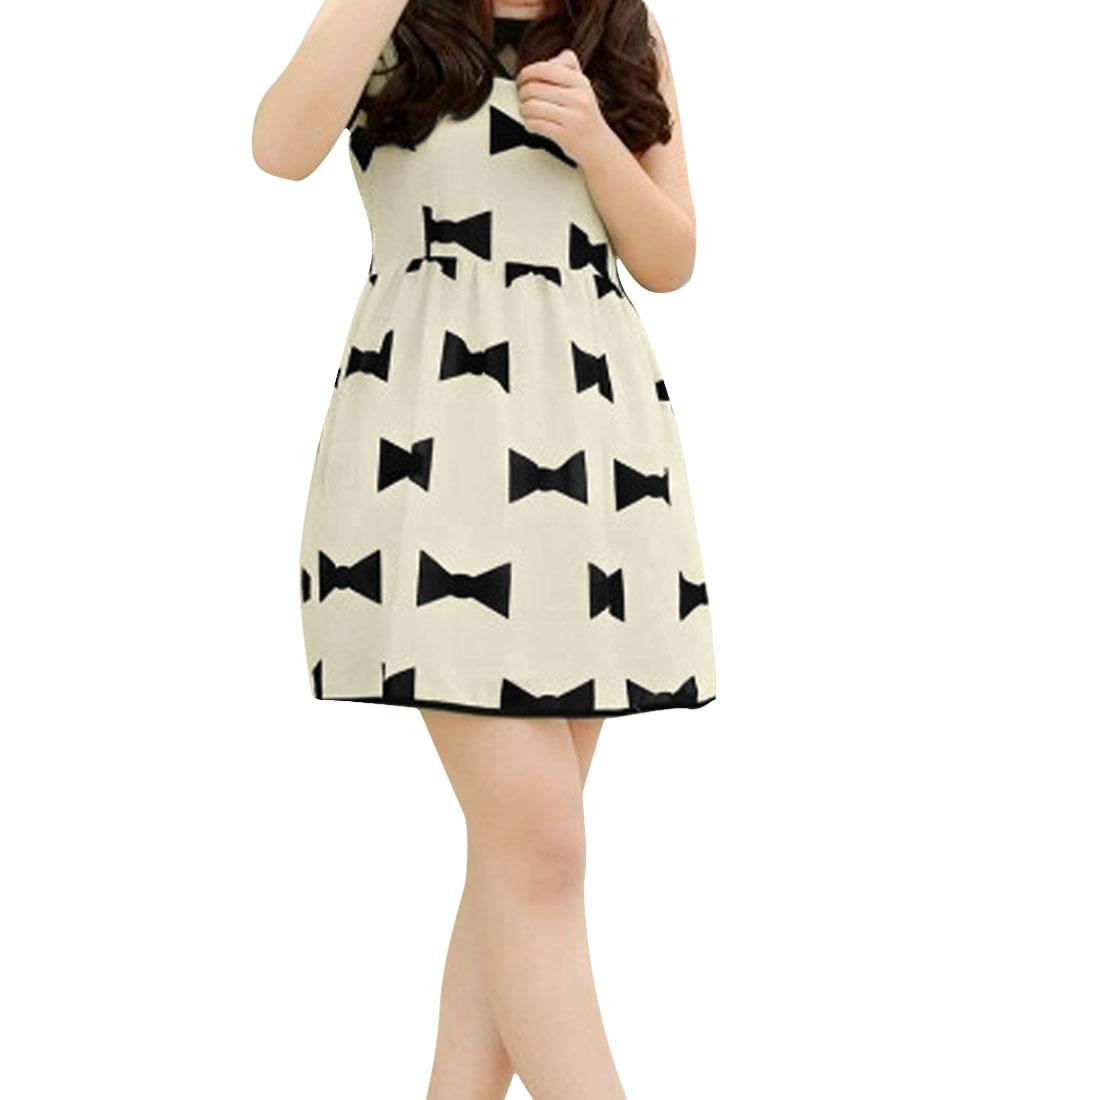 Ladies Chic Round Neck Sleeveless Mesh Splice Bowtie Prints Beige Mini Dress XS